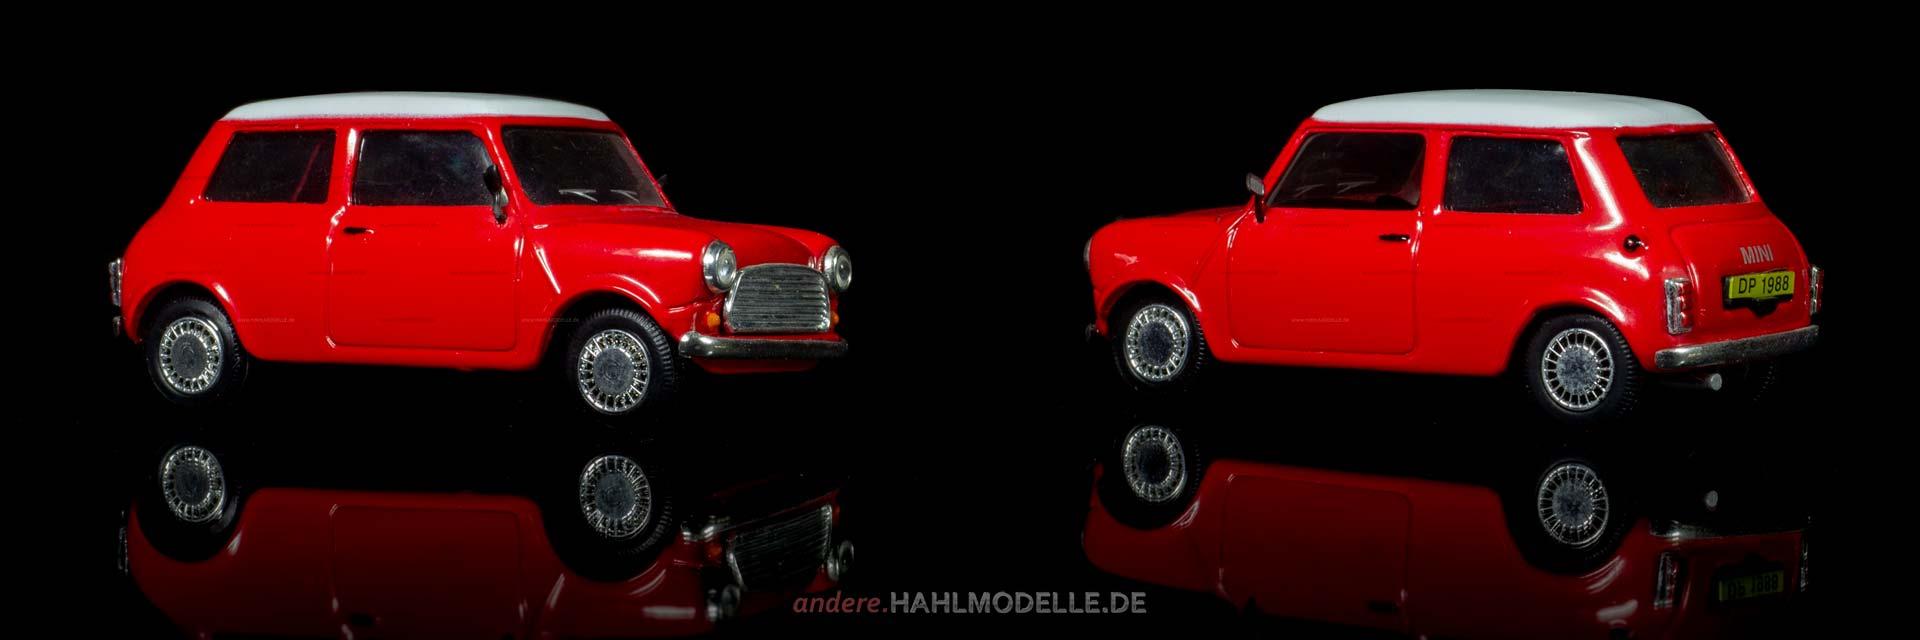 BMC Mini Cooper | Kleinwagen | Ixo (Del Prado Car Collection) | 1:43 | www.andere.hahlmodelle.de